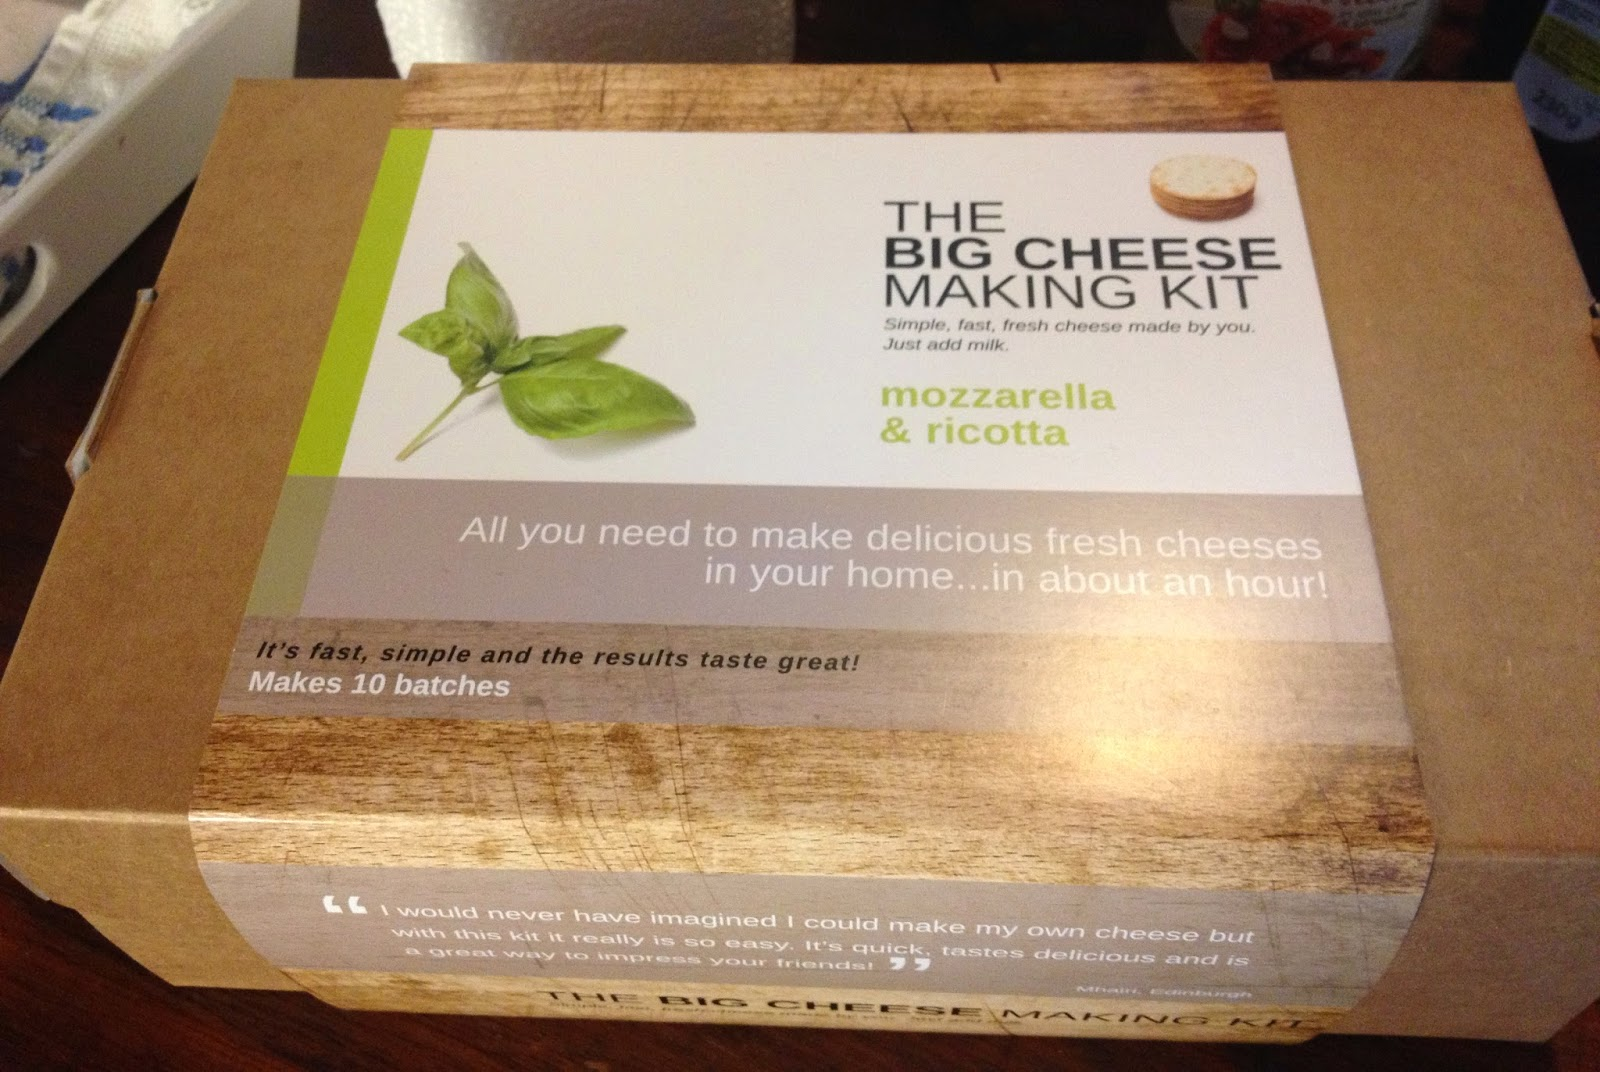 the big cheese making kit